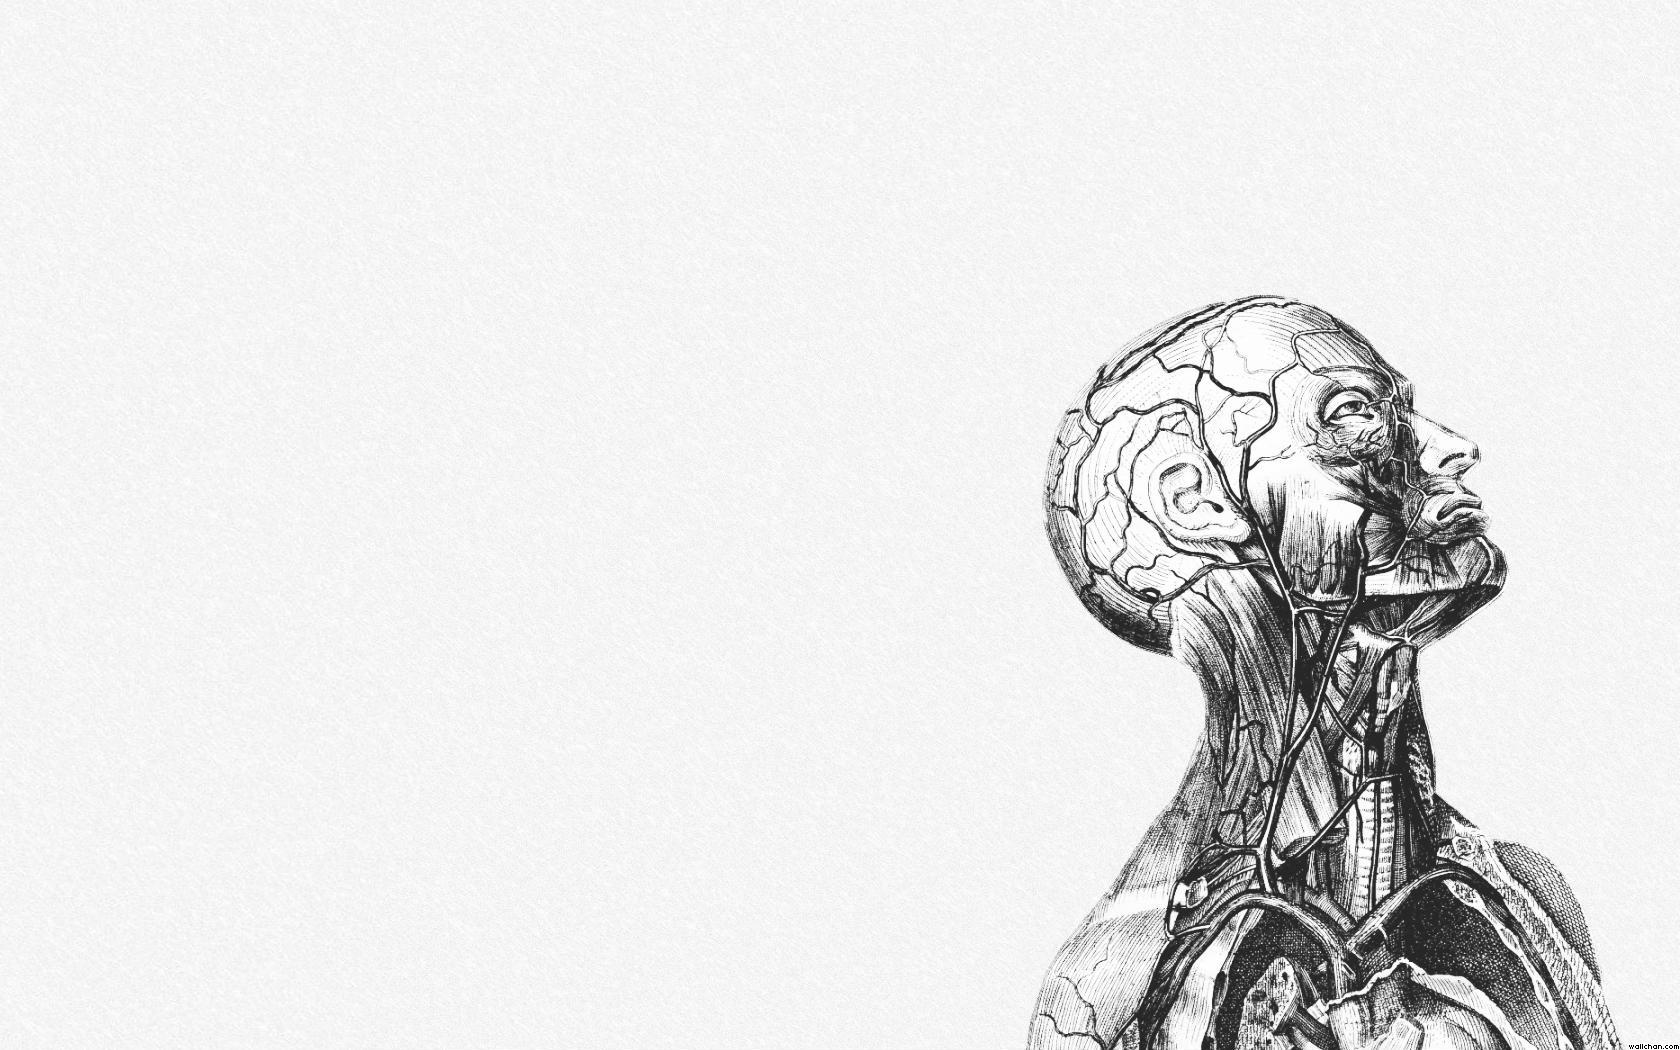 anatomy wallpaper background - photo #6